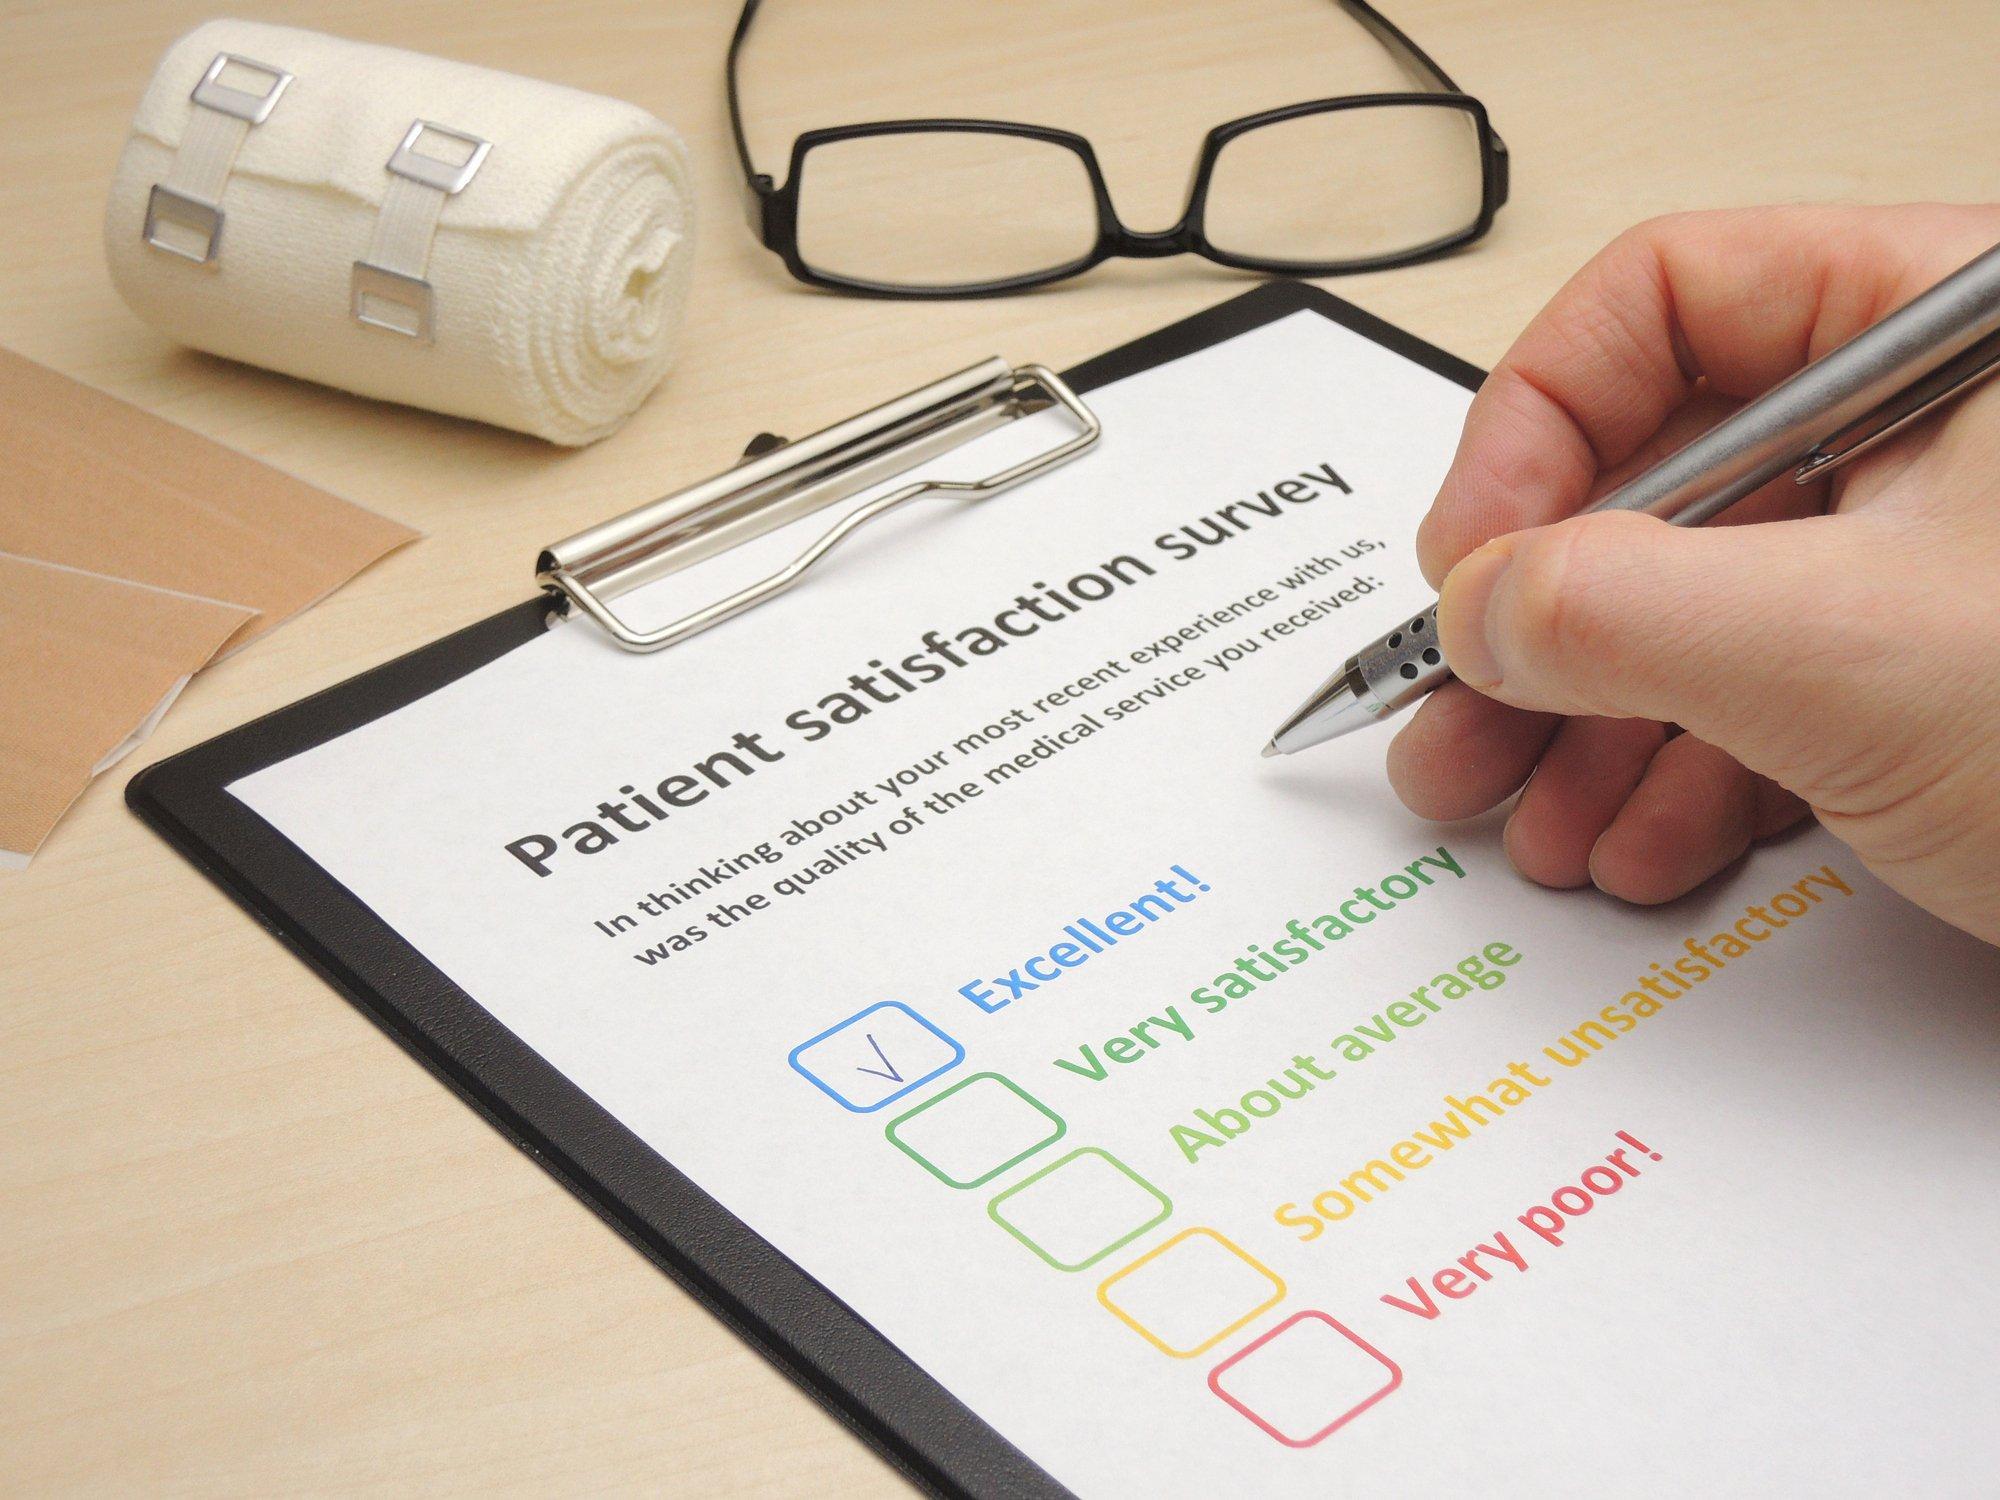 Physician Satisfaction Survey Questions Elegant Line Physician Reviews Don T Reflect Patient